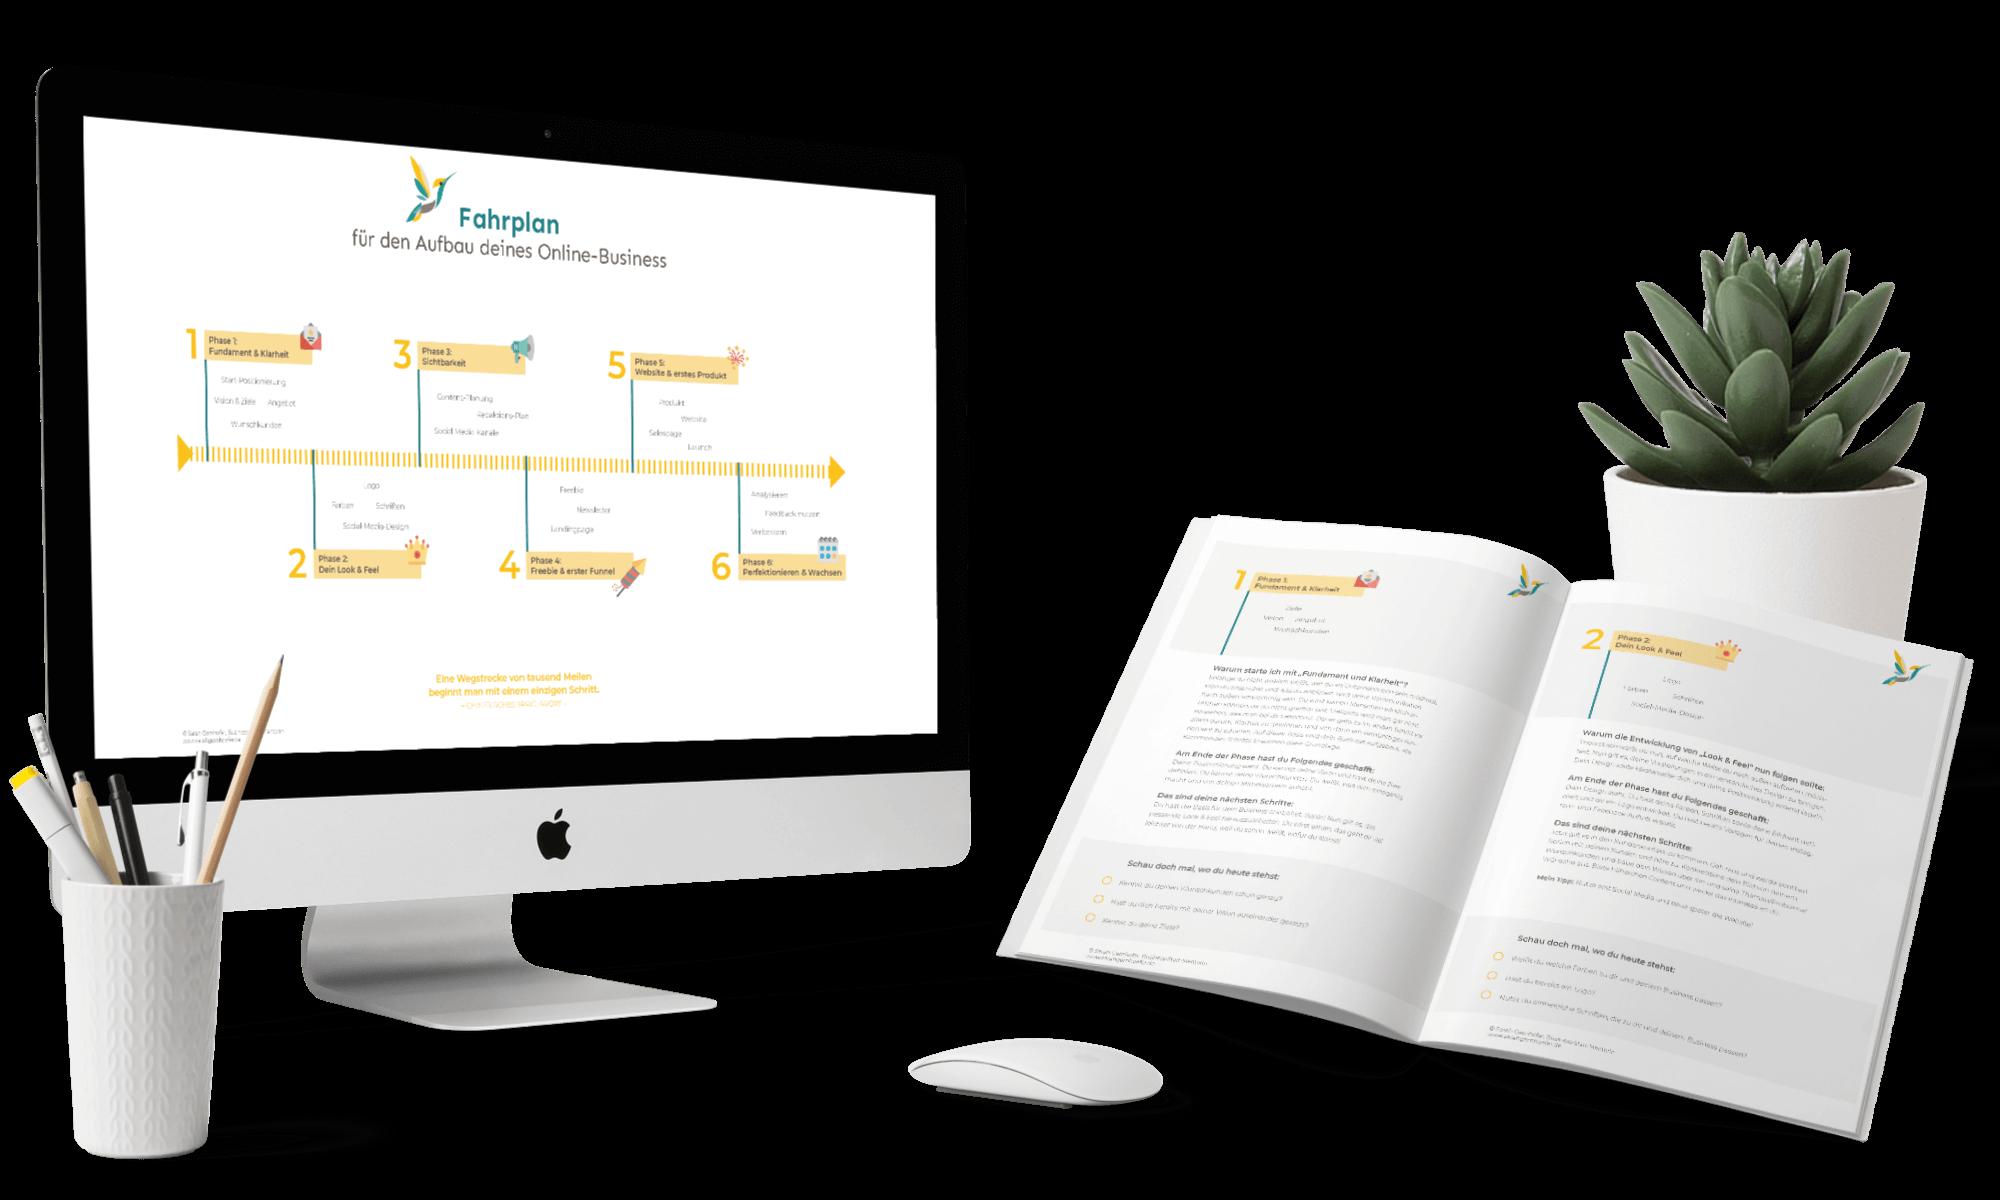 Online-Business-Fahrplan